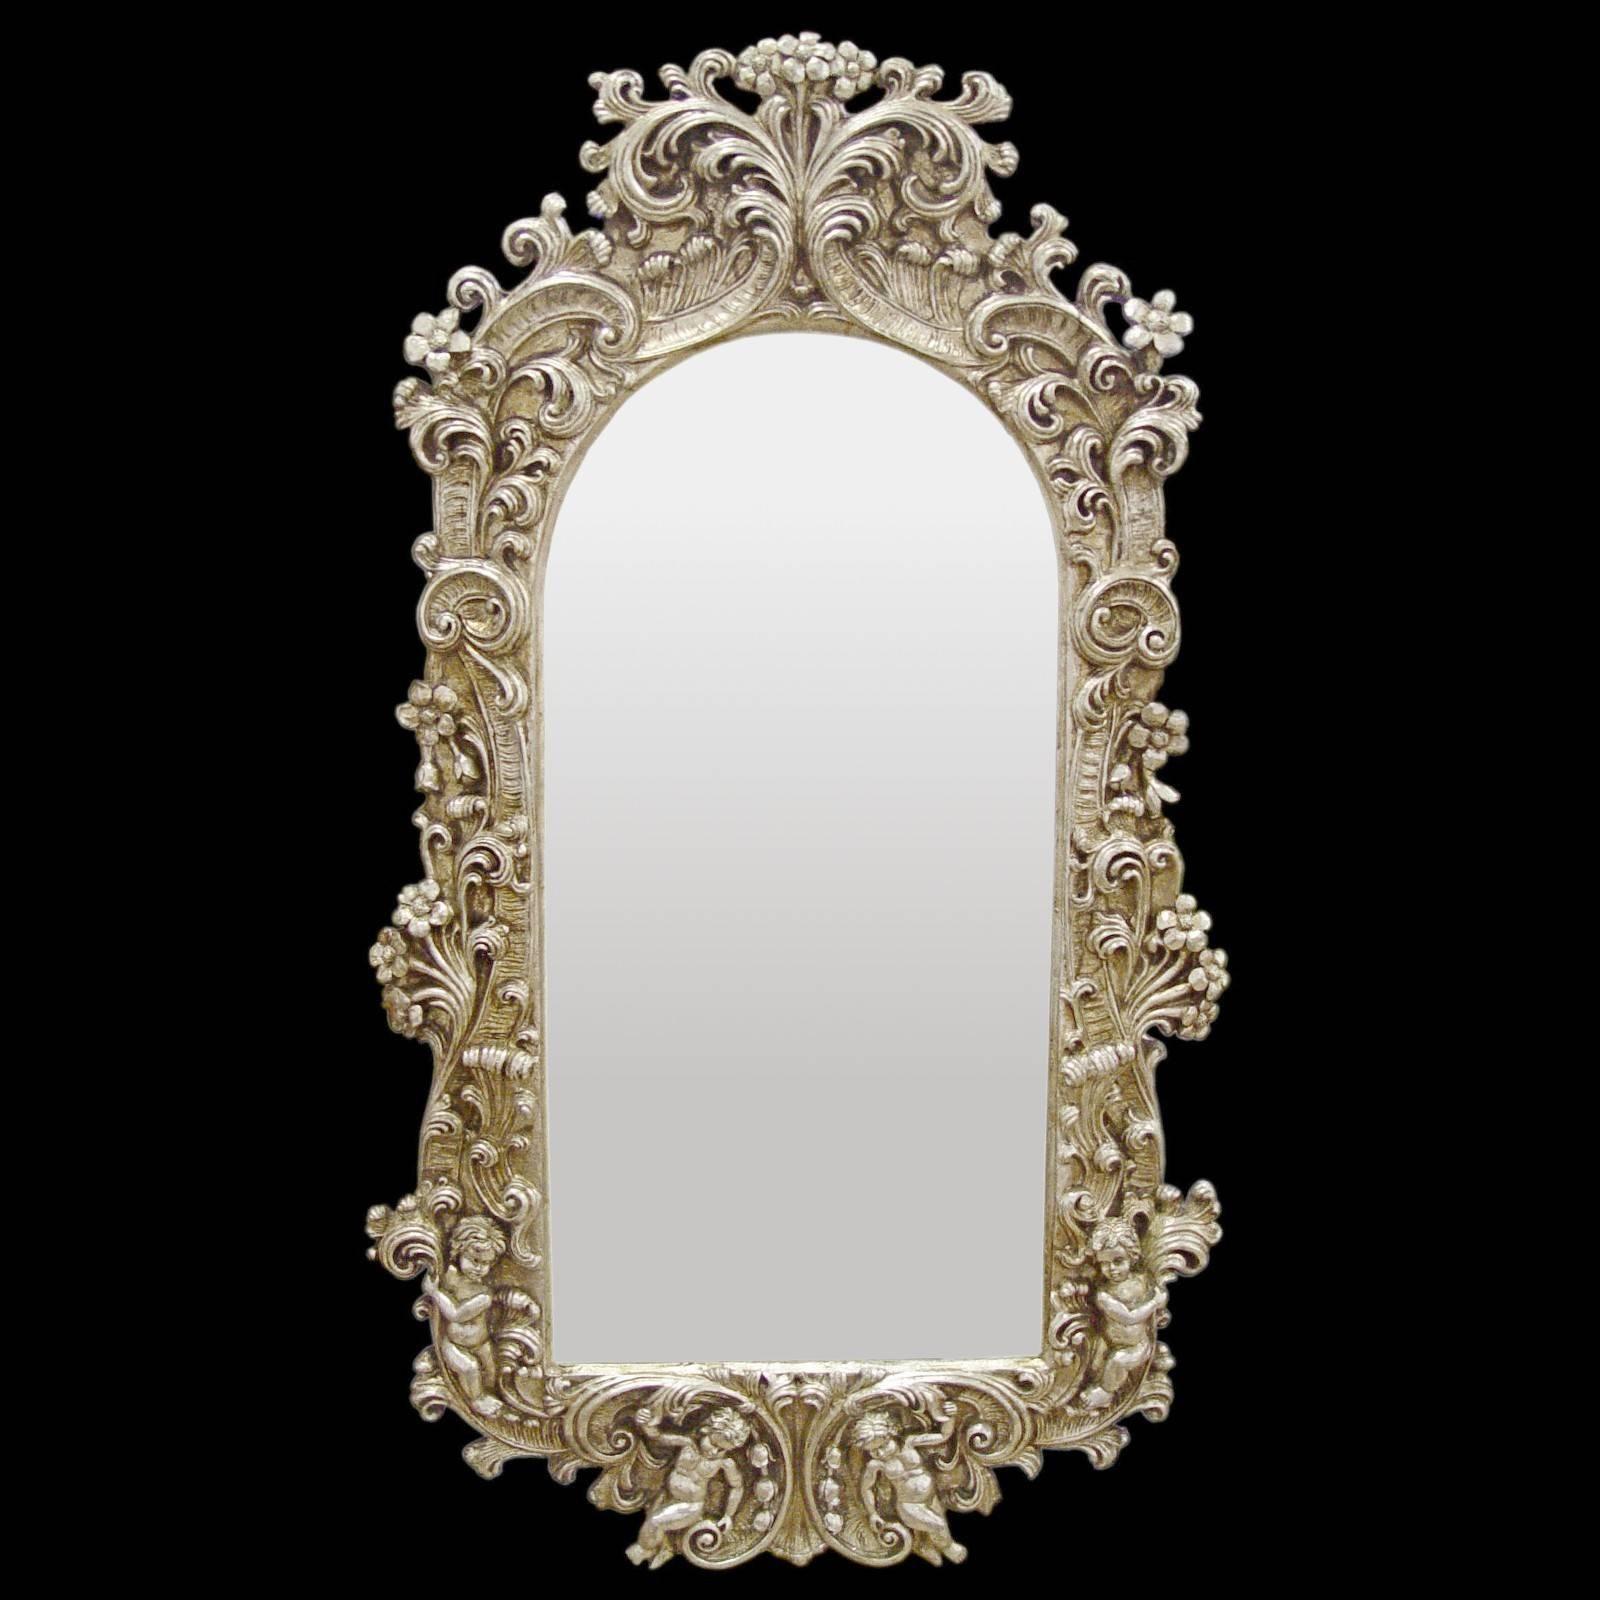 Wall Furniture Baroque Splendor Mirror Frame Baroque Silver Regarding Baroque Wall Mirrors (View 14 of 15)